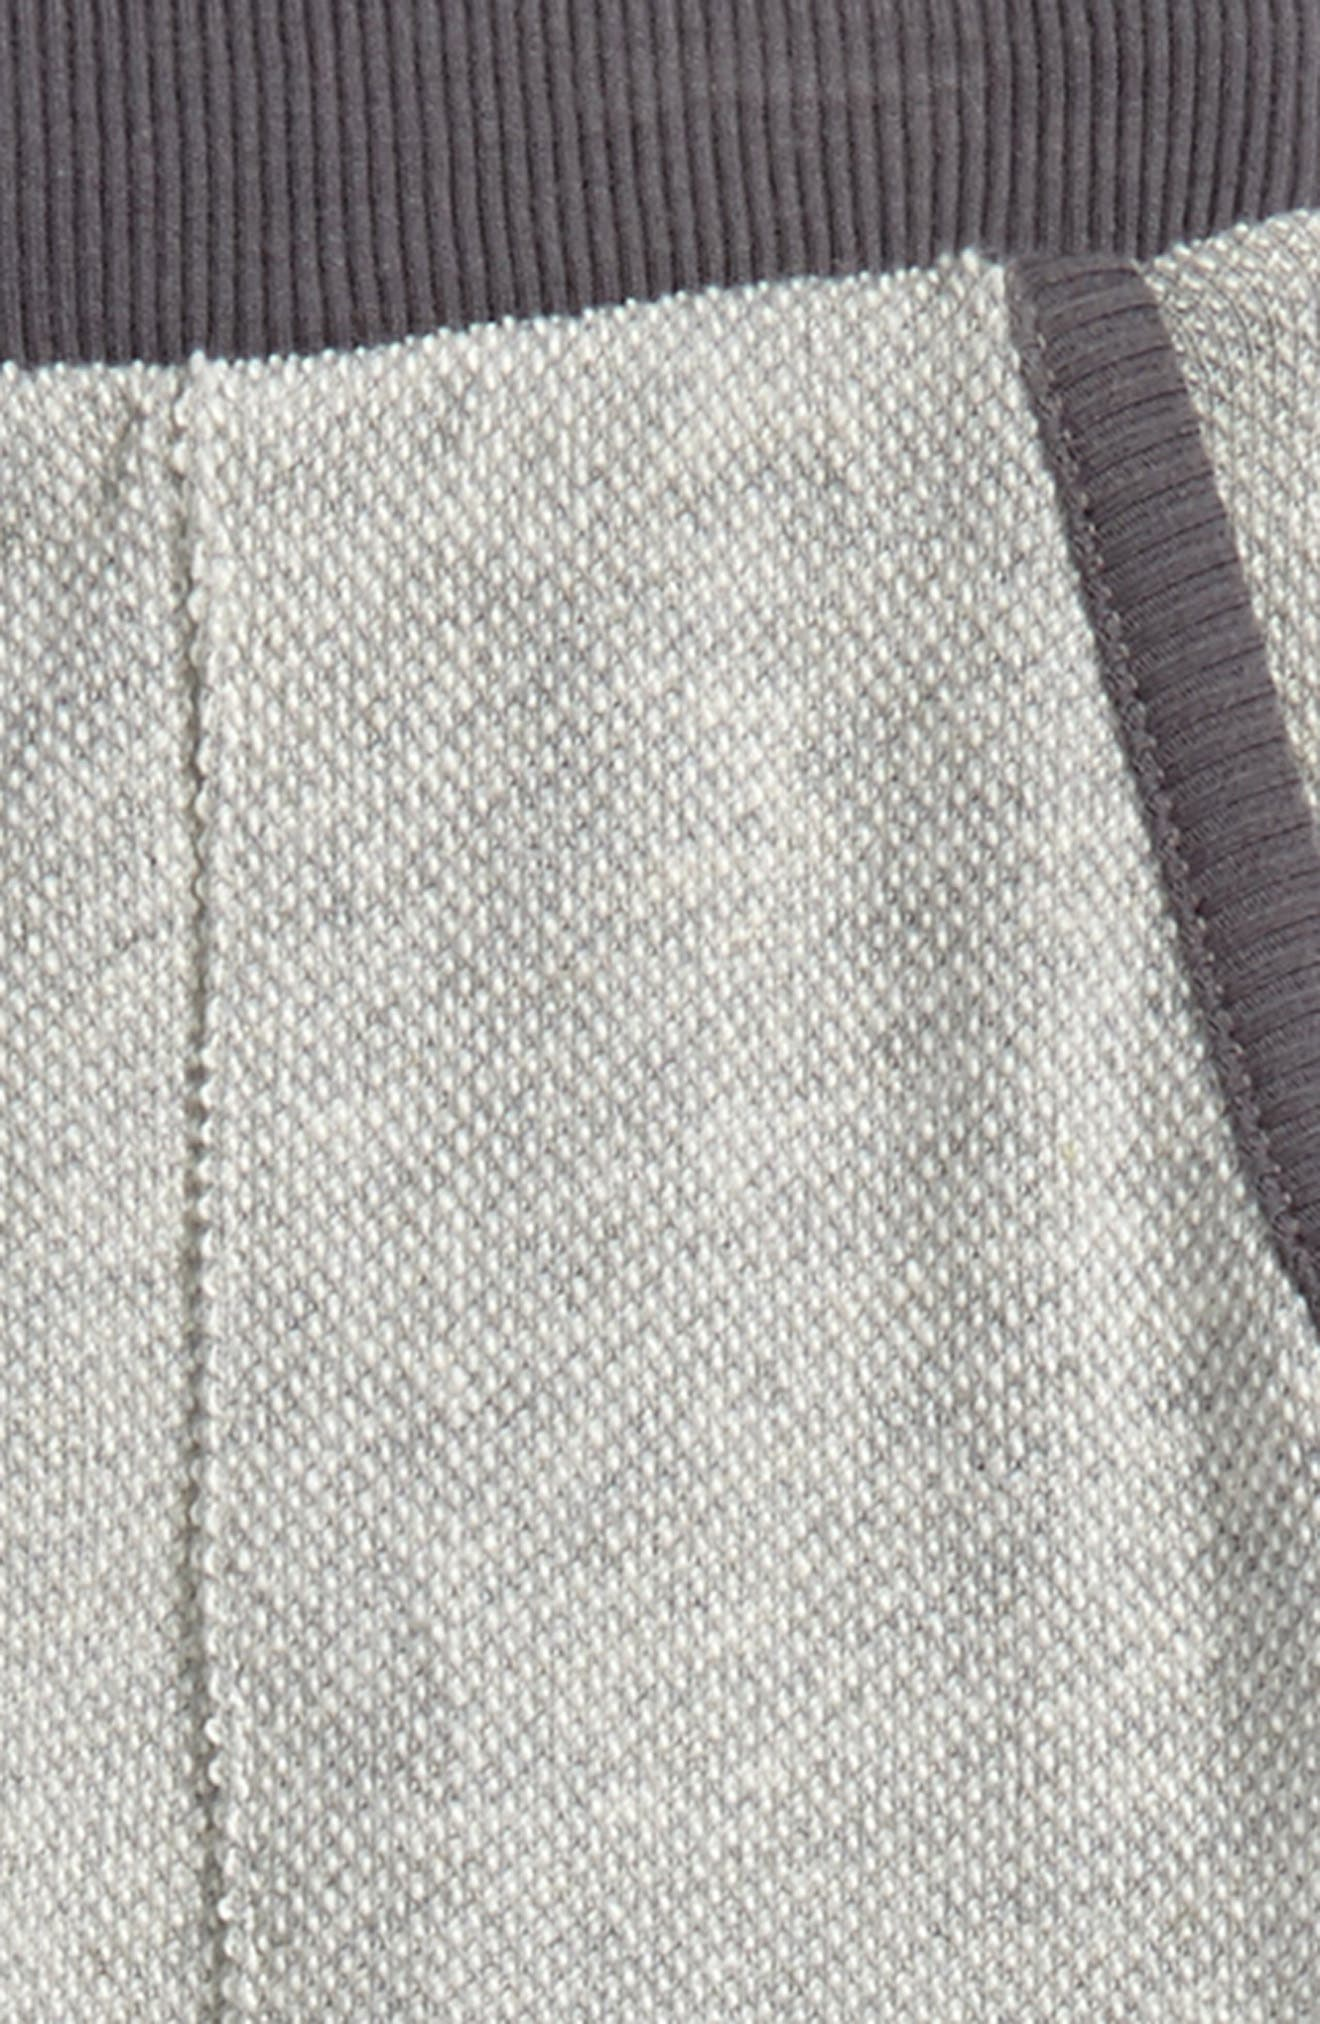 Alternate Image 2  - Burt's Bees Baby Organic Cotton Sweatpants (Toddler Boys & Little Boys)